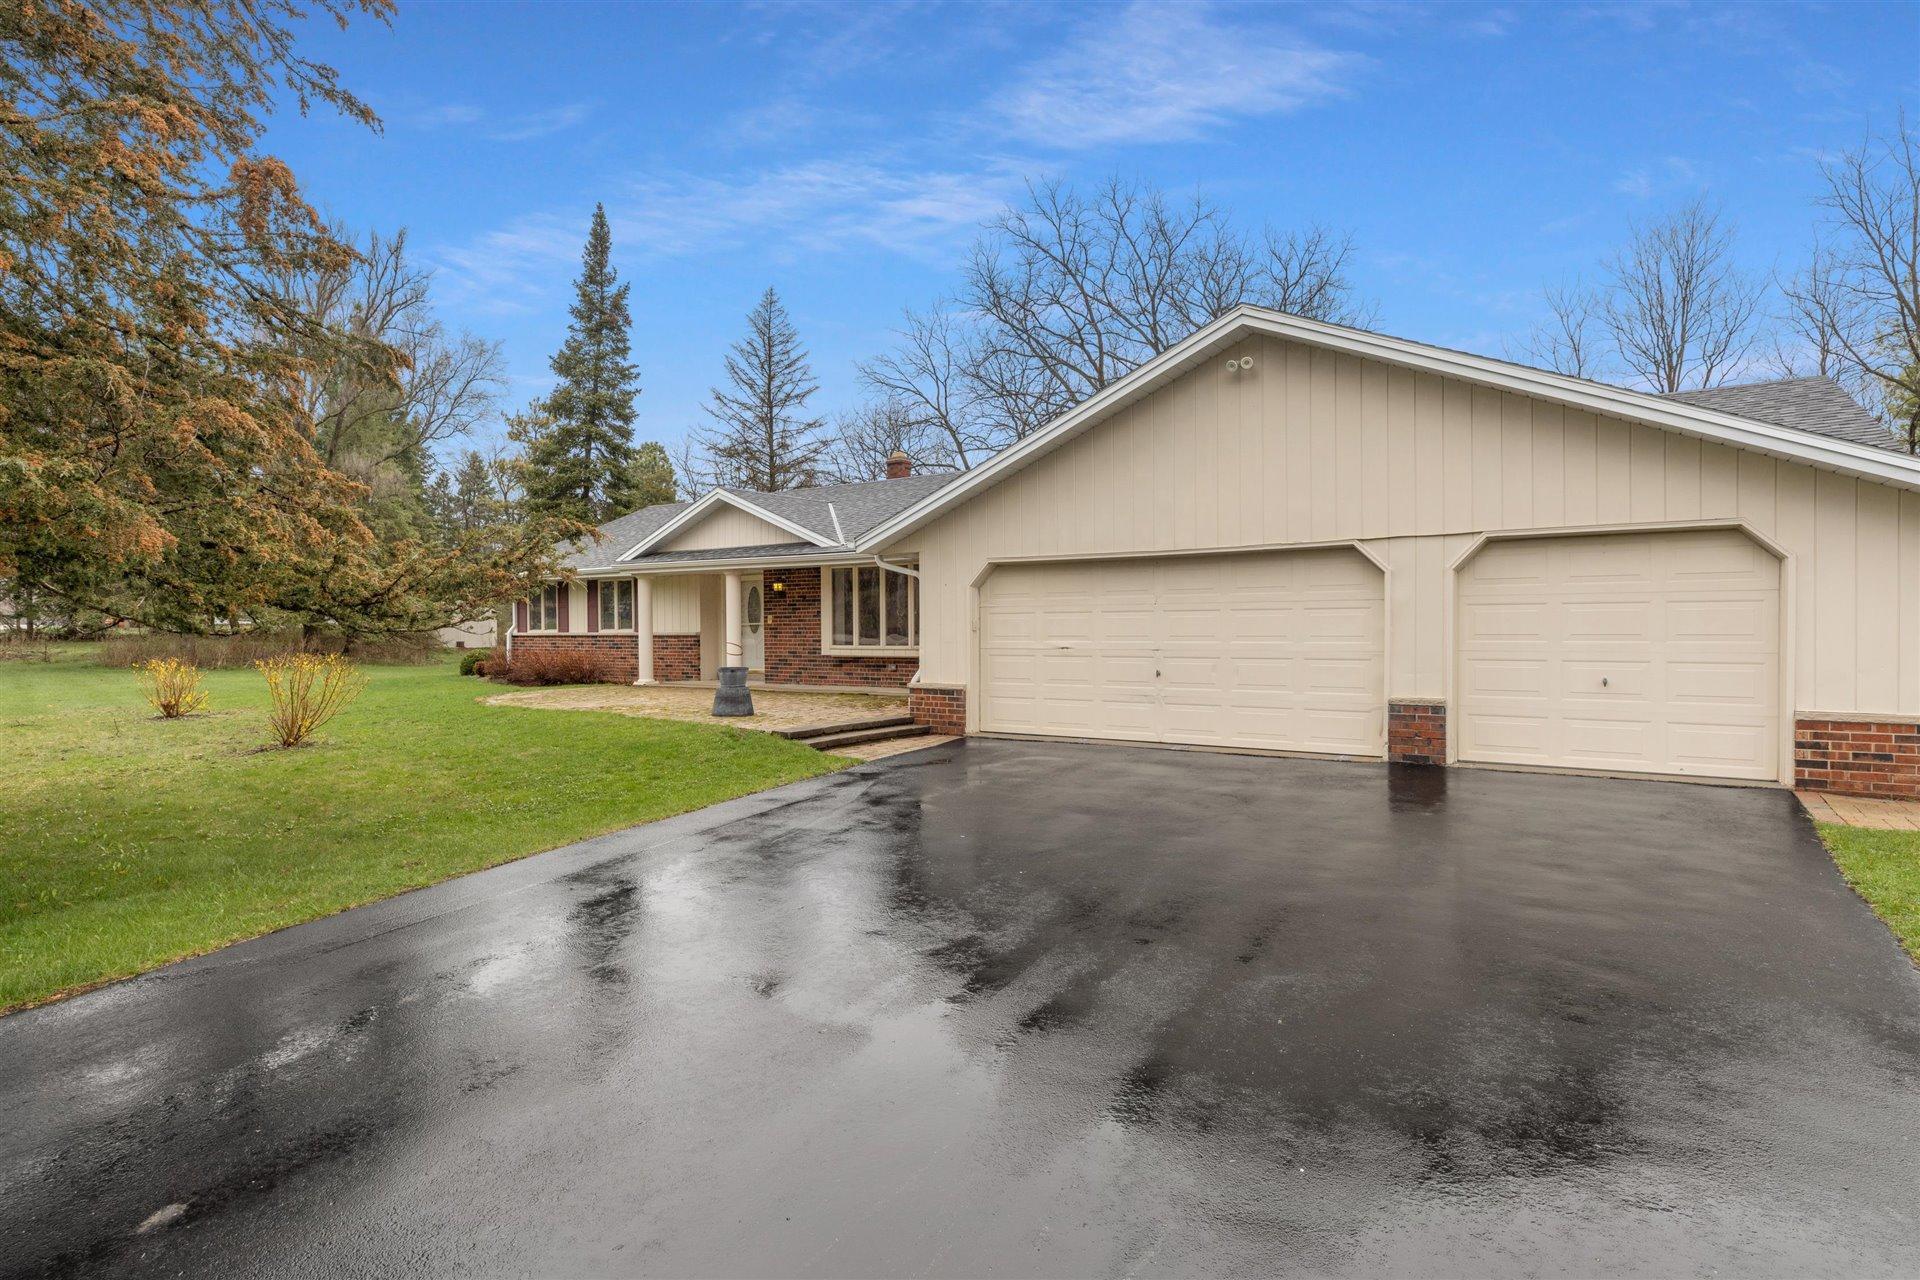 2337 Hillside Dr, Delafield, Wisconsin 53018, 3 Bedrooms Bedrooms, ,3 BathroomsBathrooms,Single-Family,For Sale,Hillside Dr,1734578